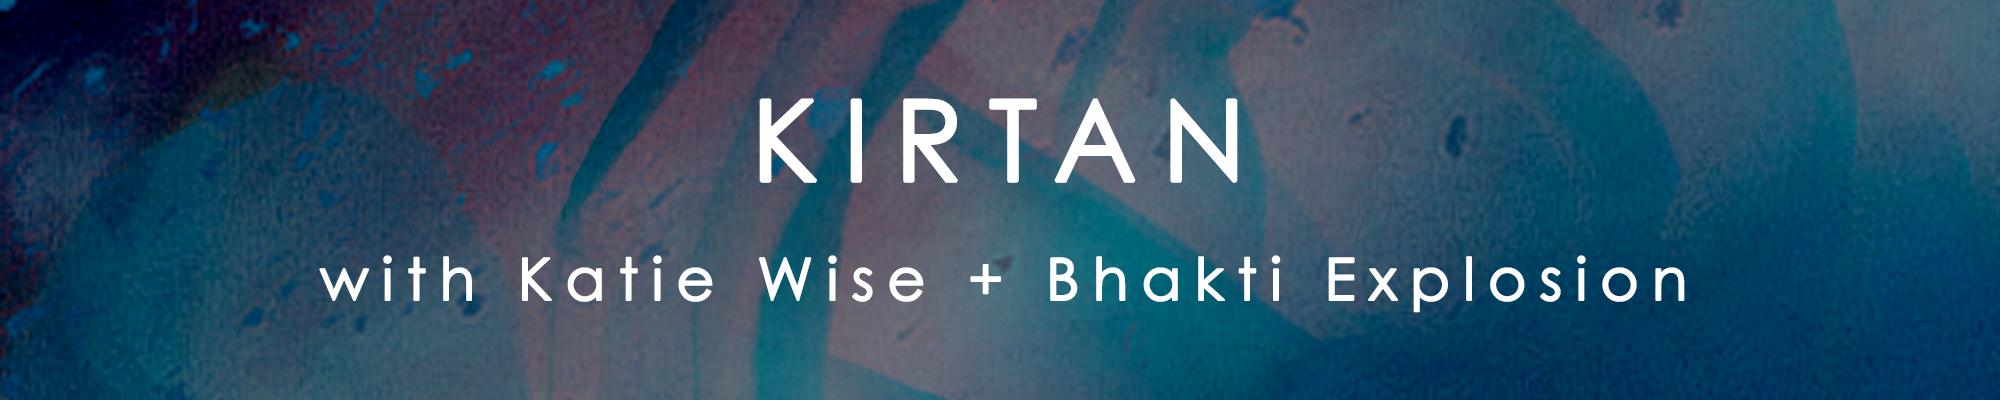 KirtanKatieWise+BhaktiExplosion_EventBanner.jpg